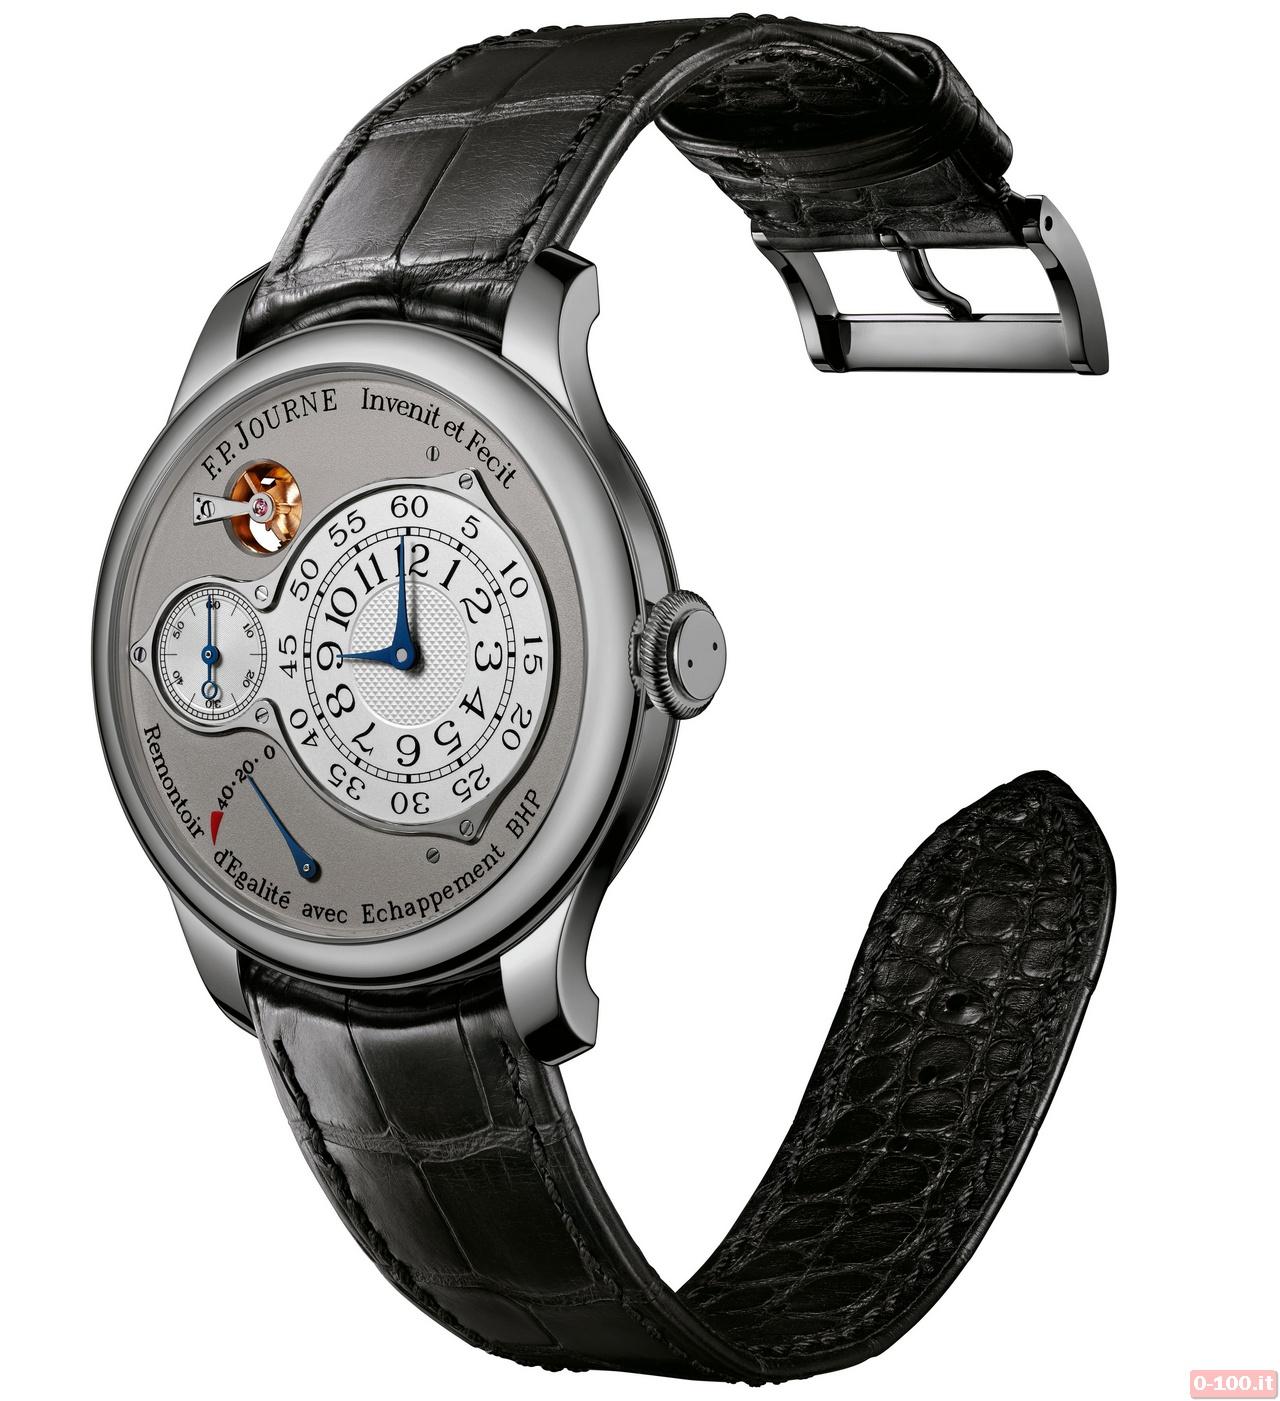 f-p-journe-chronometre-optimum-0-100_4